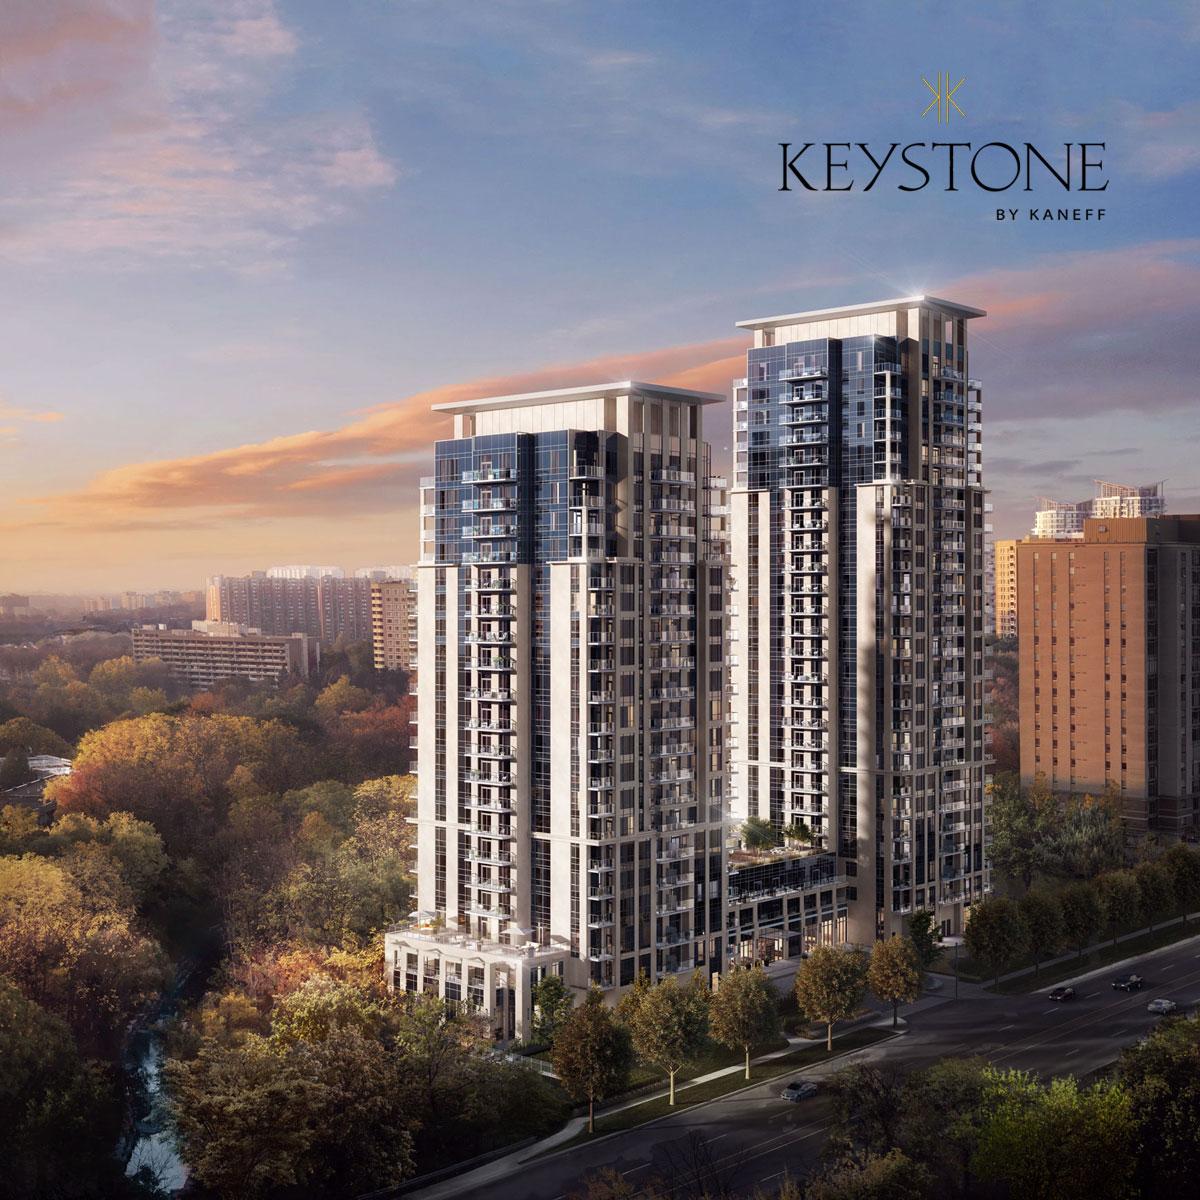 Keystone by Kaneff